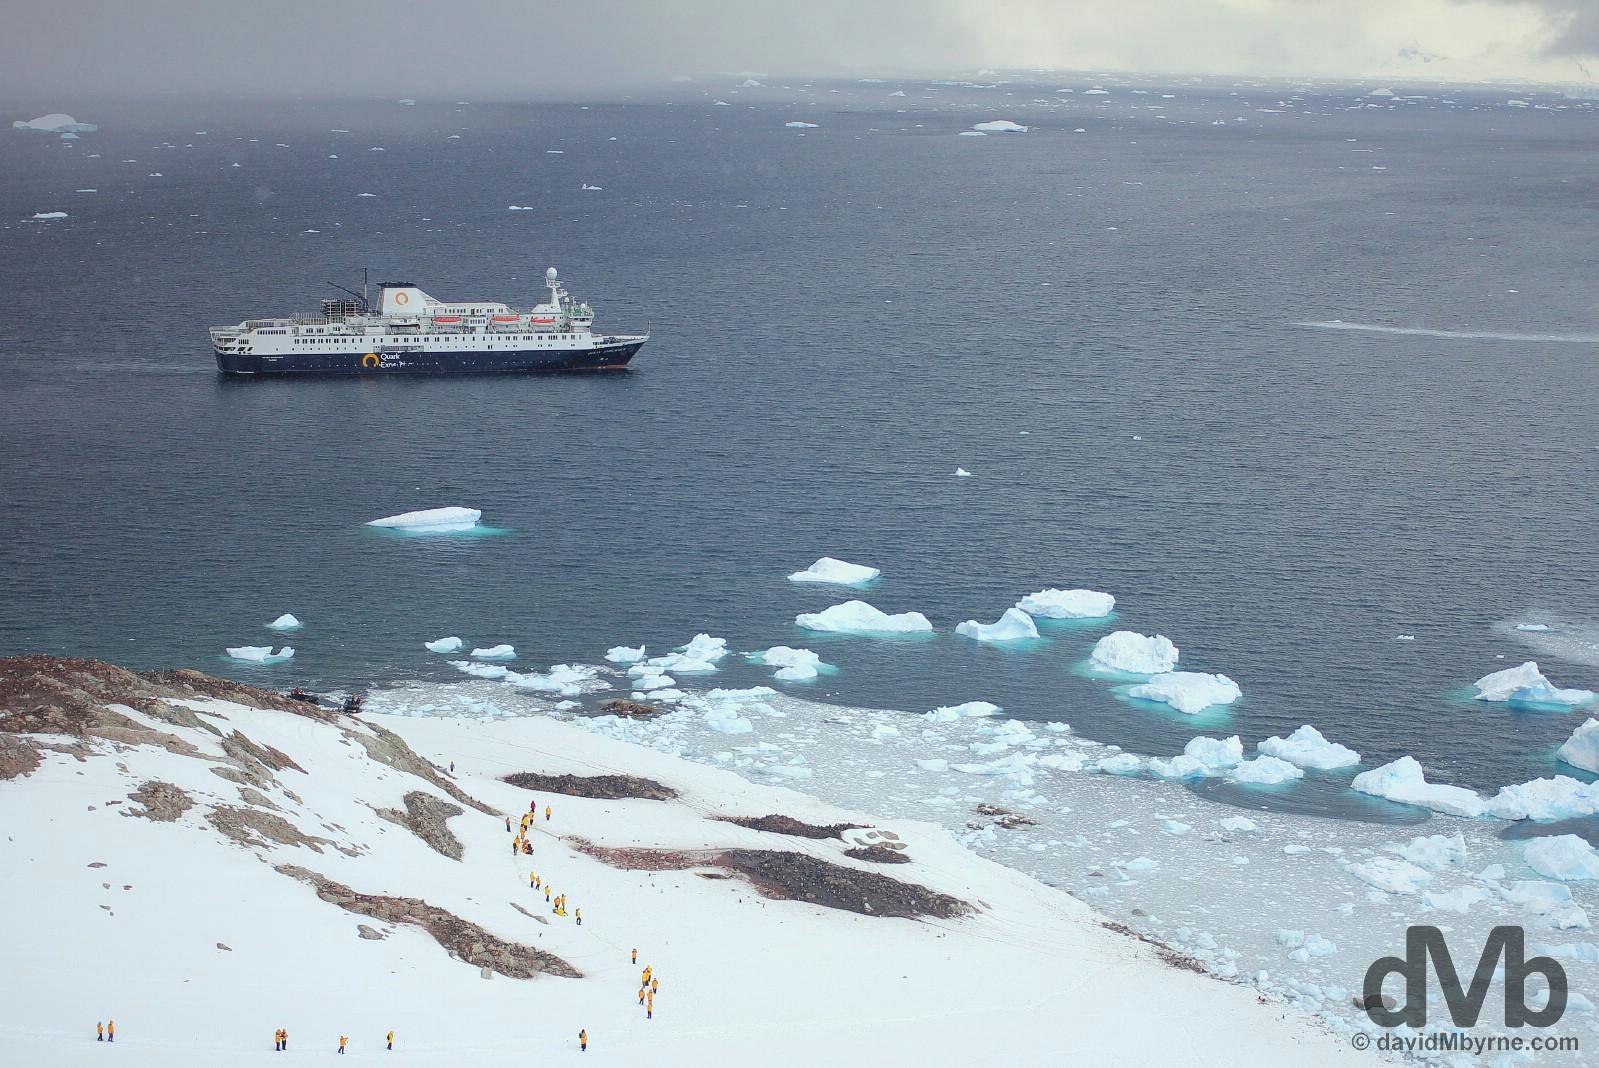 The M/V Ocean Endeavour in Neko Harbour, Antarctic Peninsula. November 30, 2015.